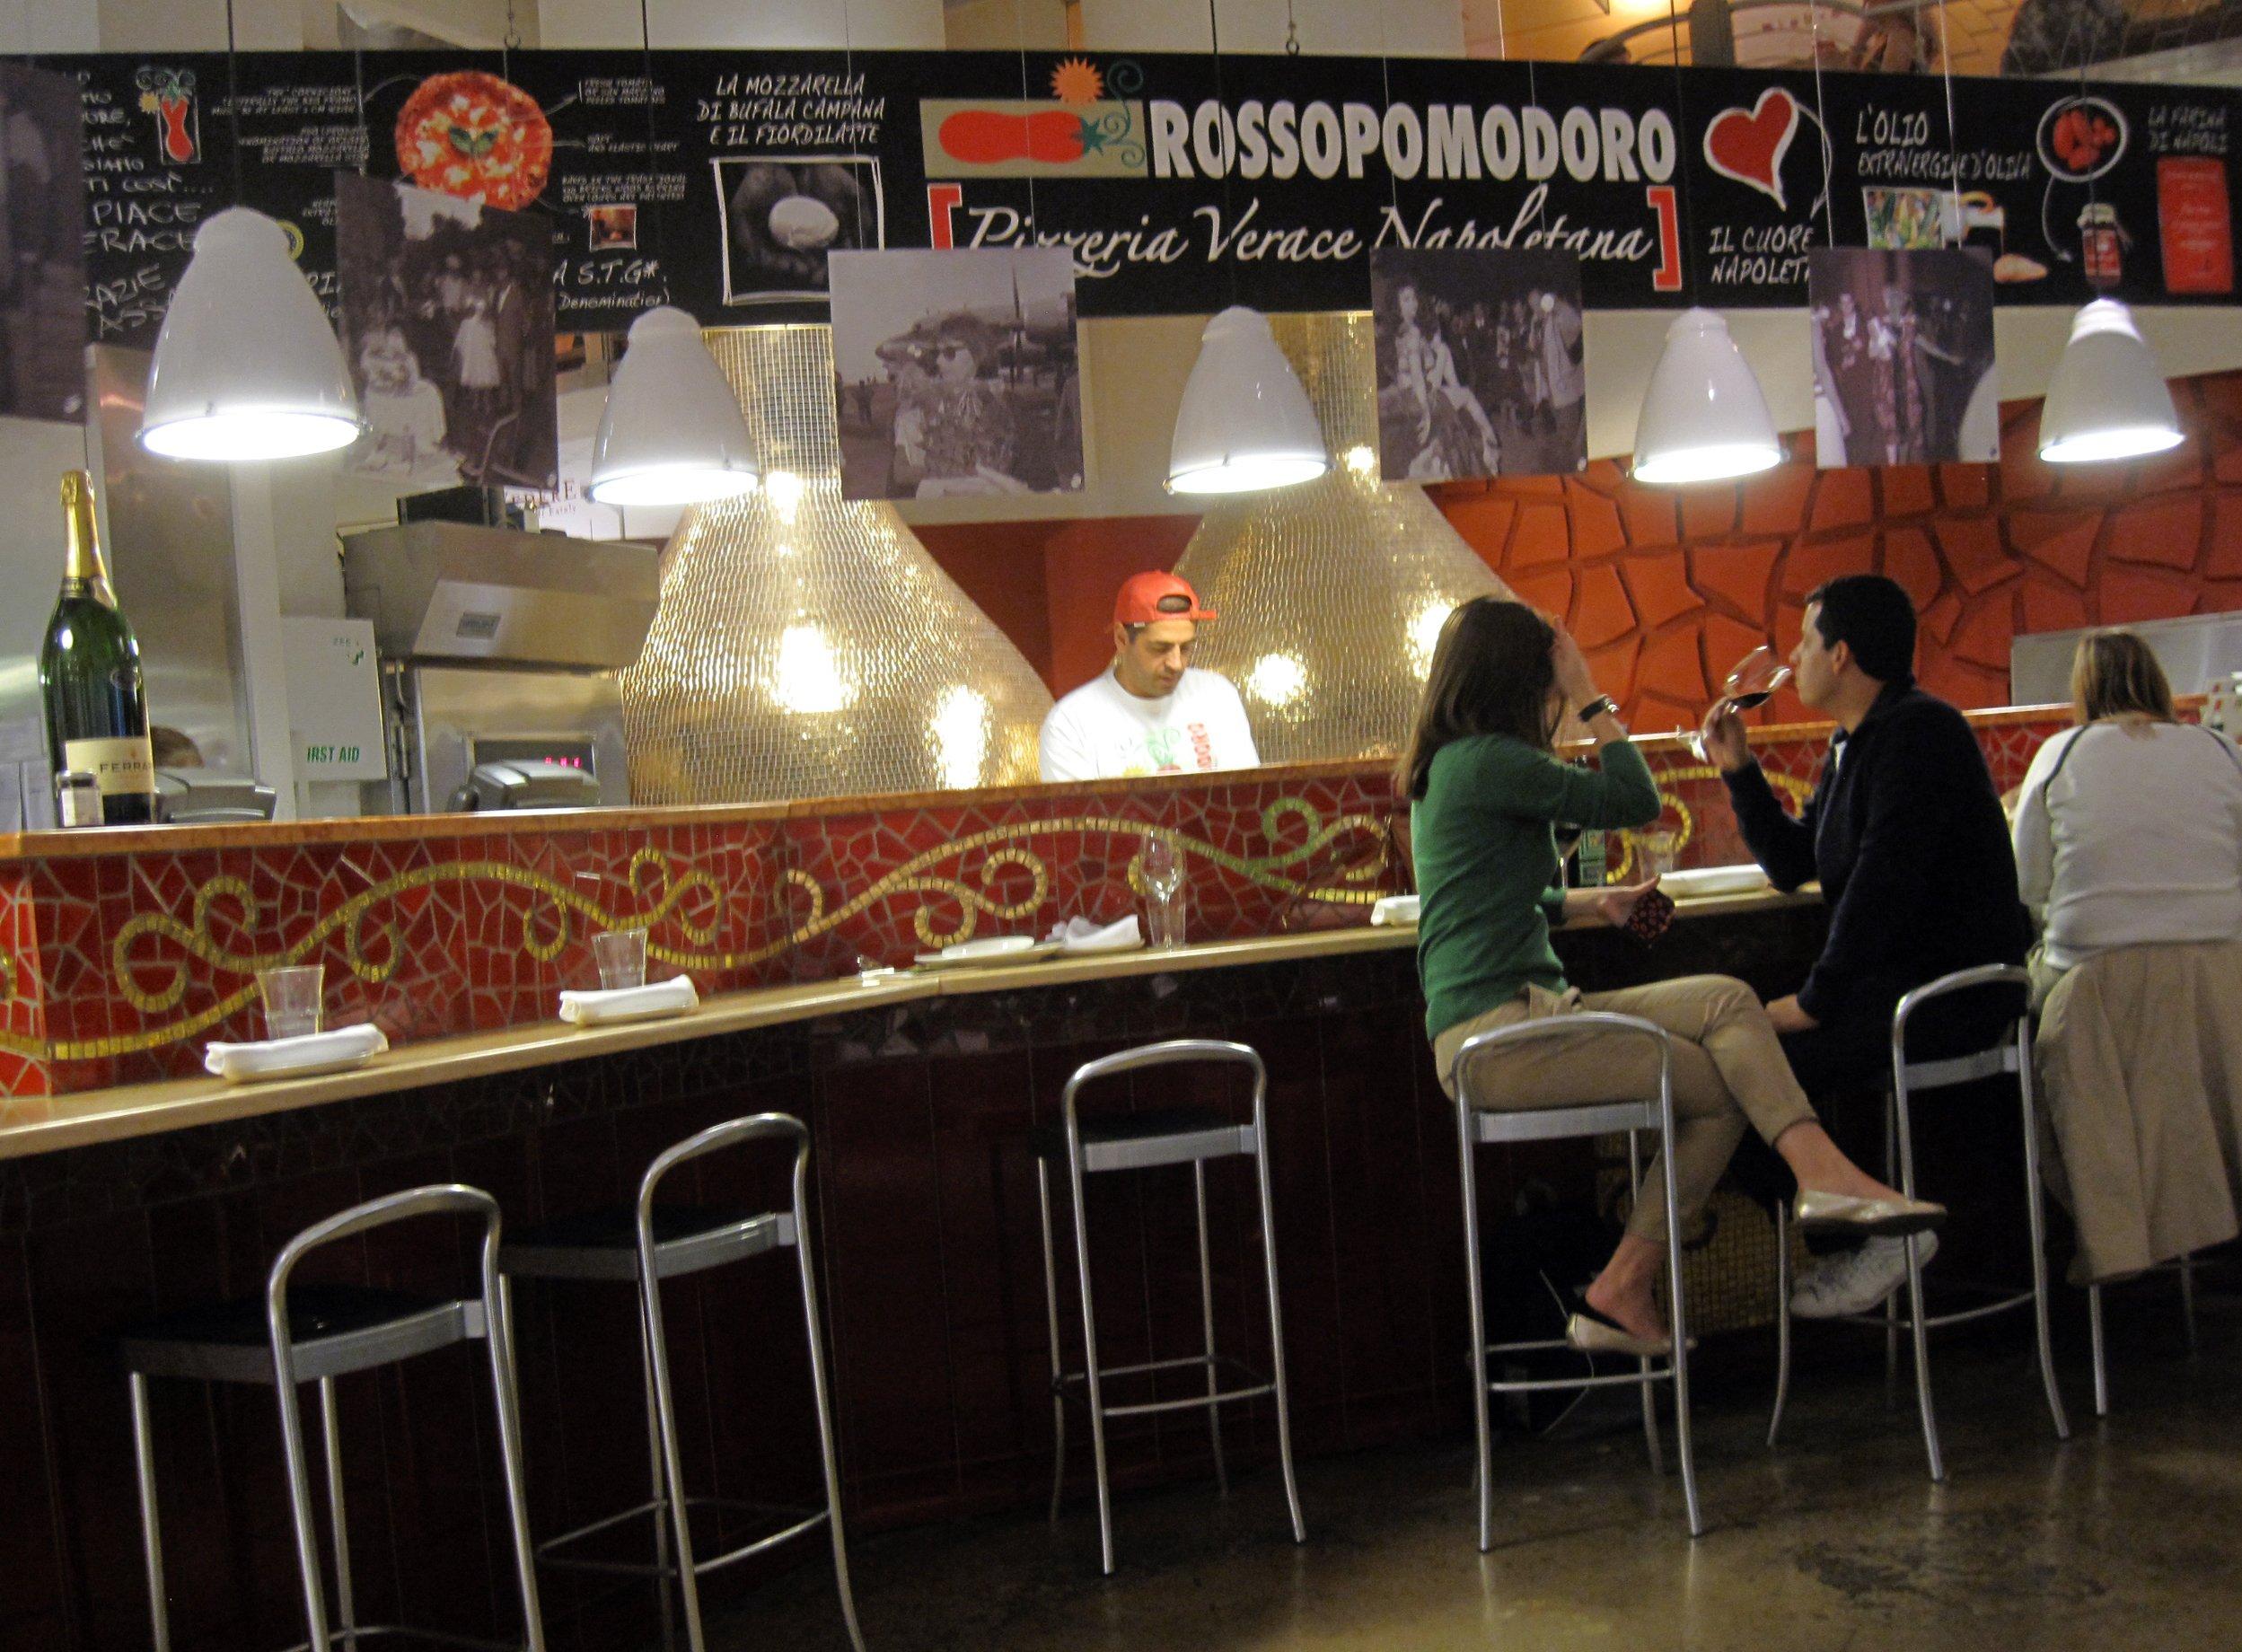 schmuck restaurant arget